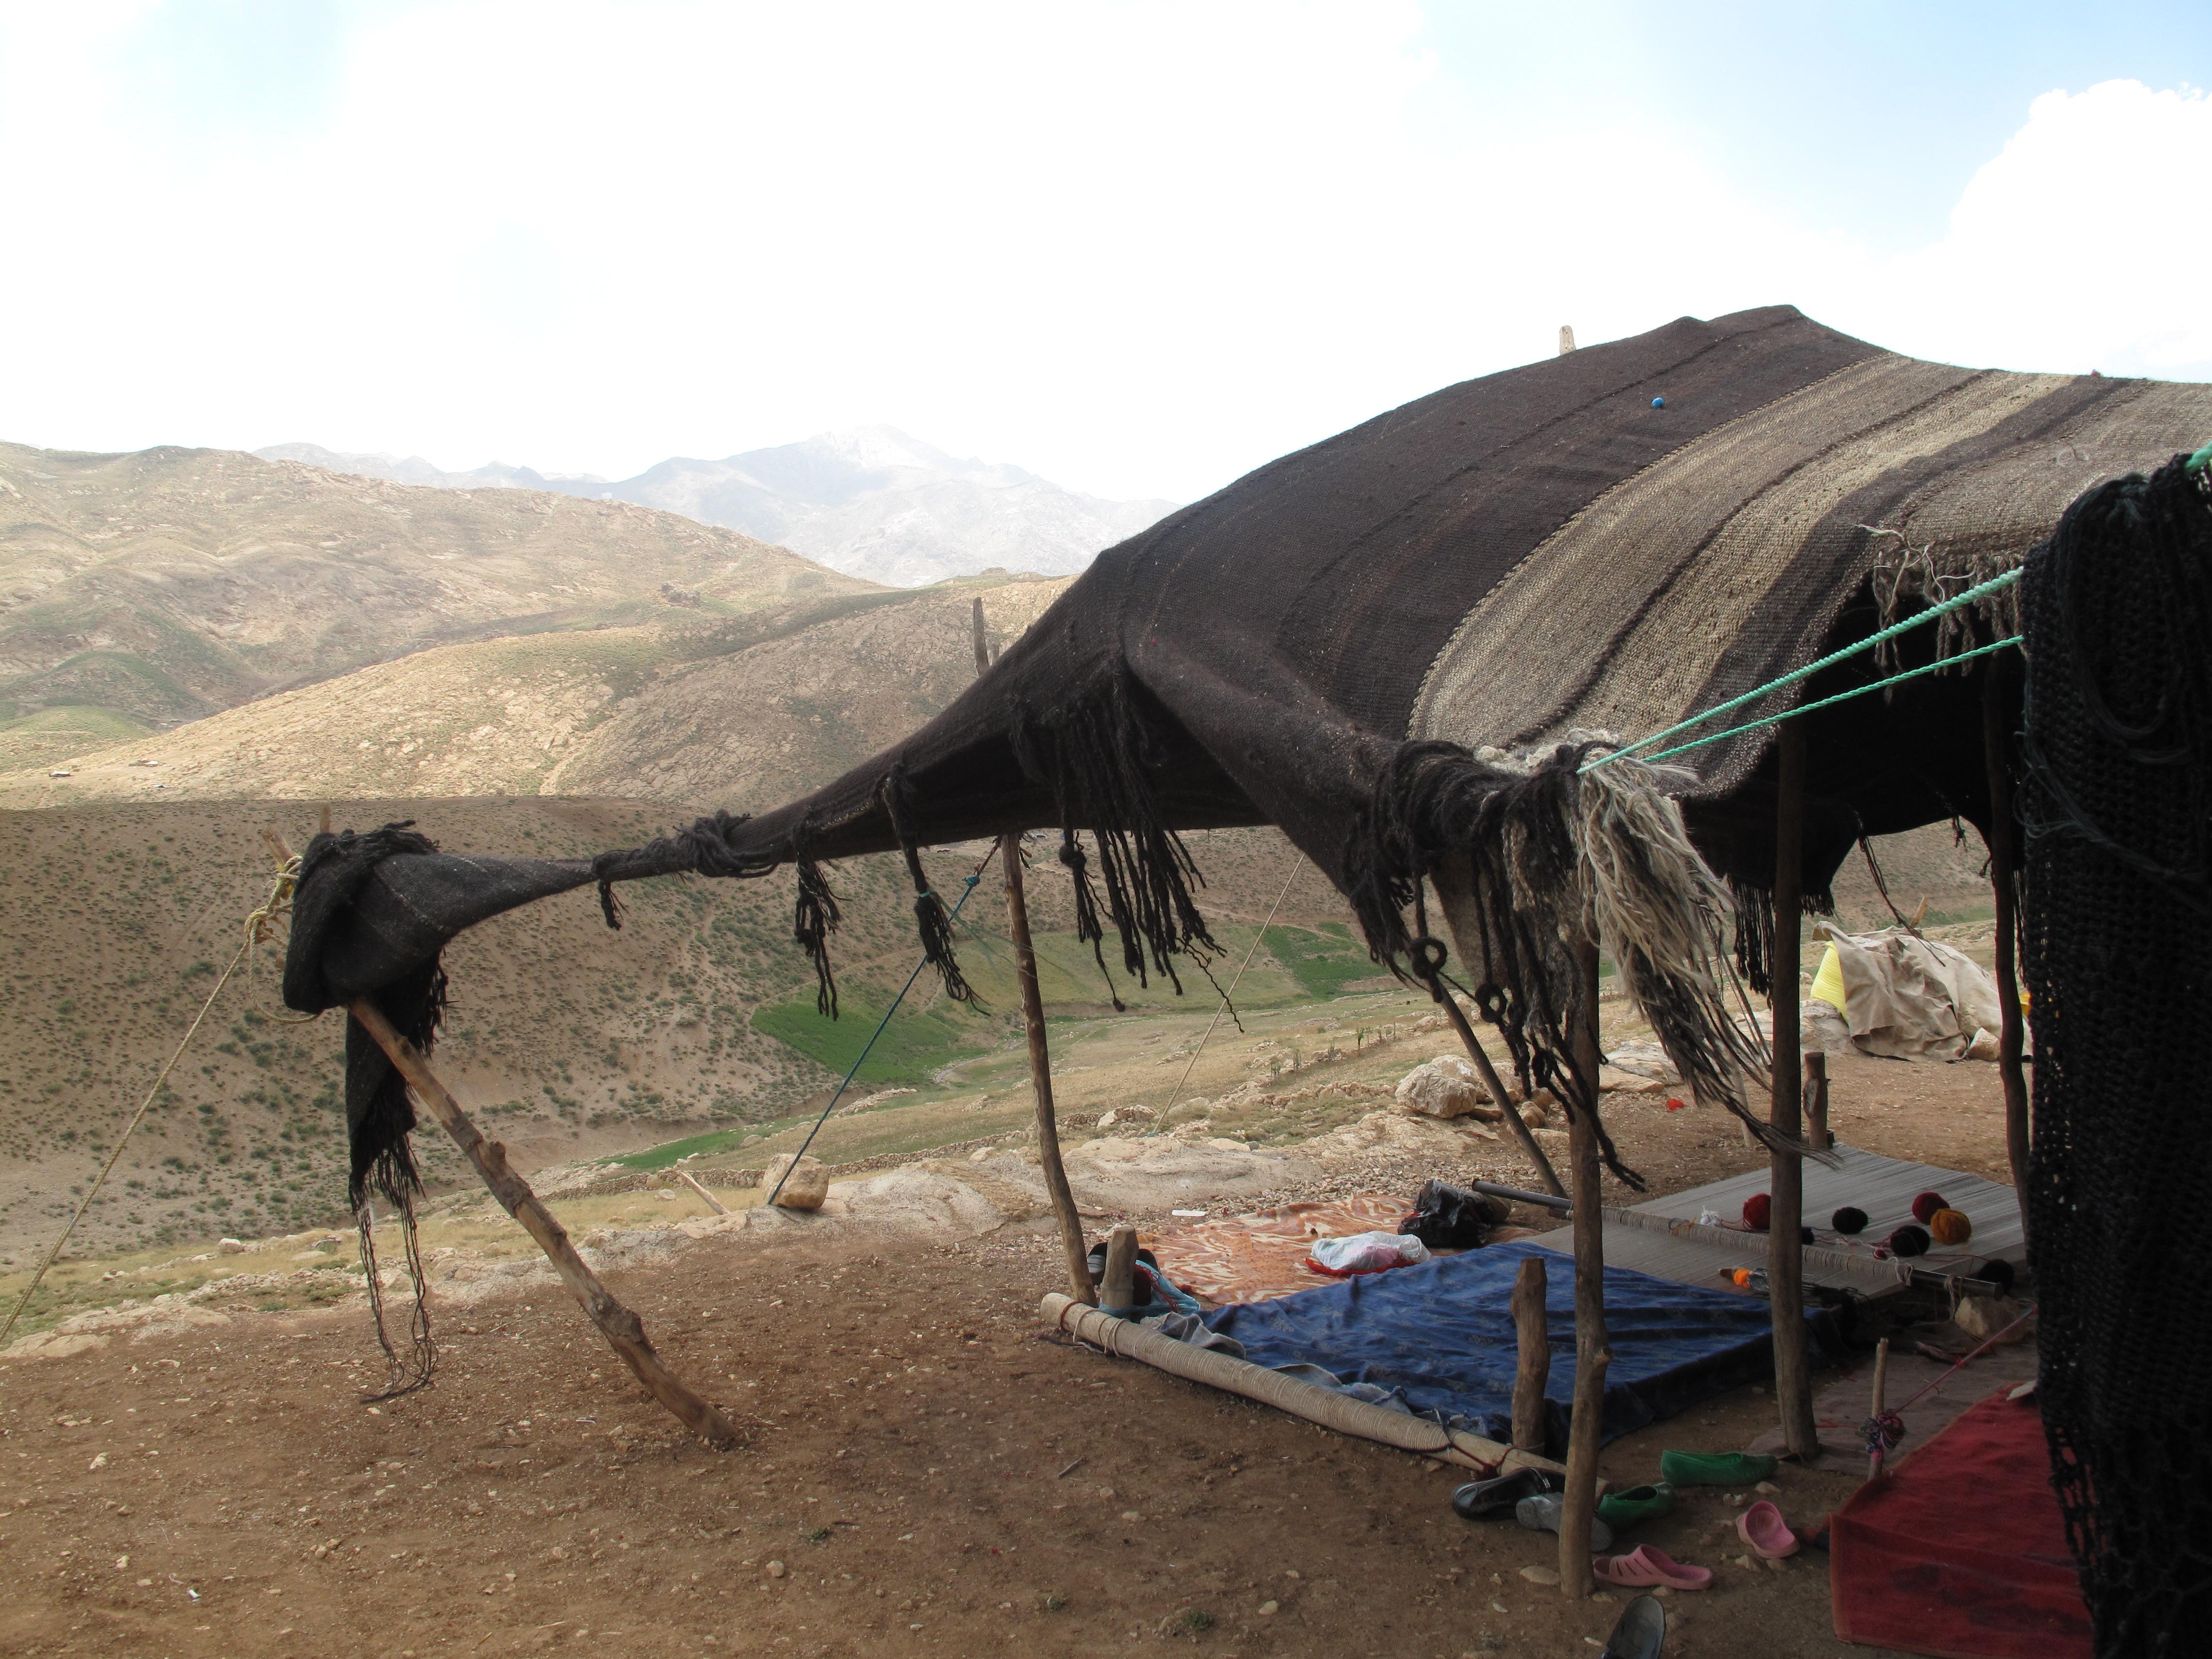 Tent in wind